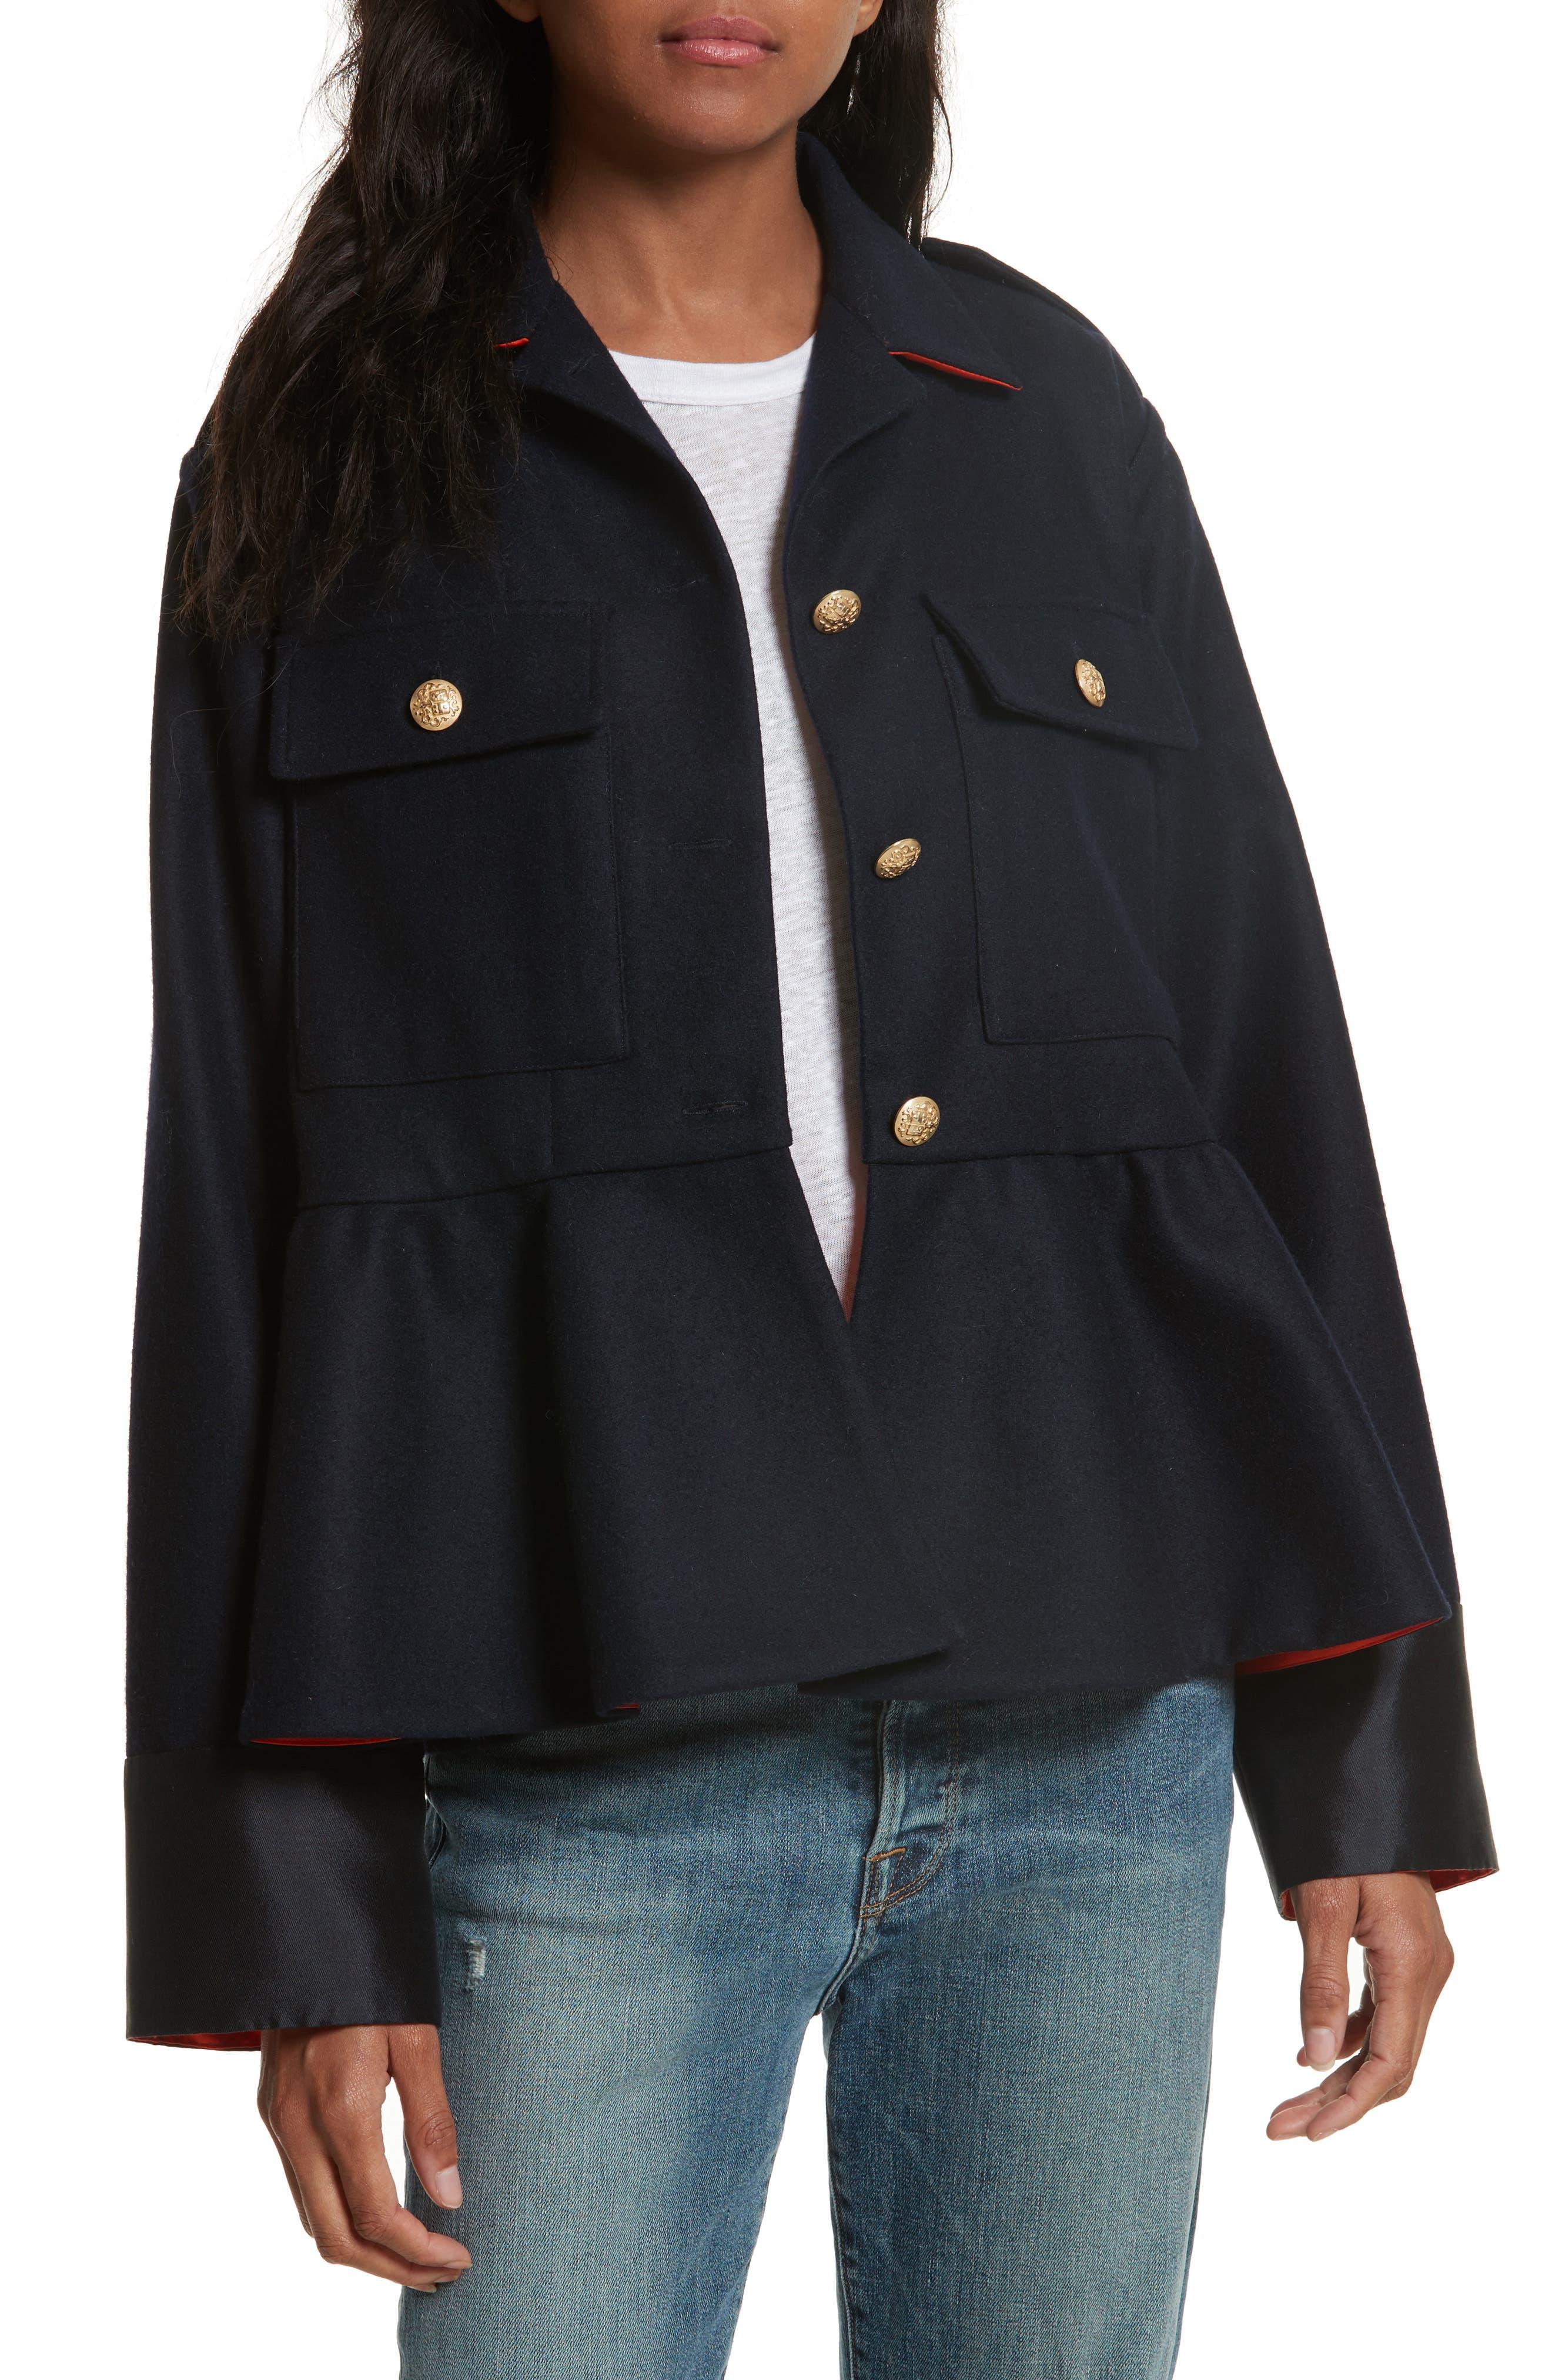 Harvey Faircloth Wool Blend Flannel Peplum Jacket